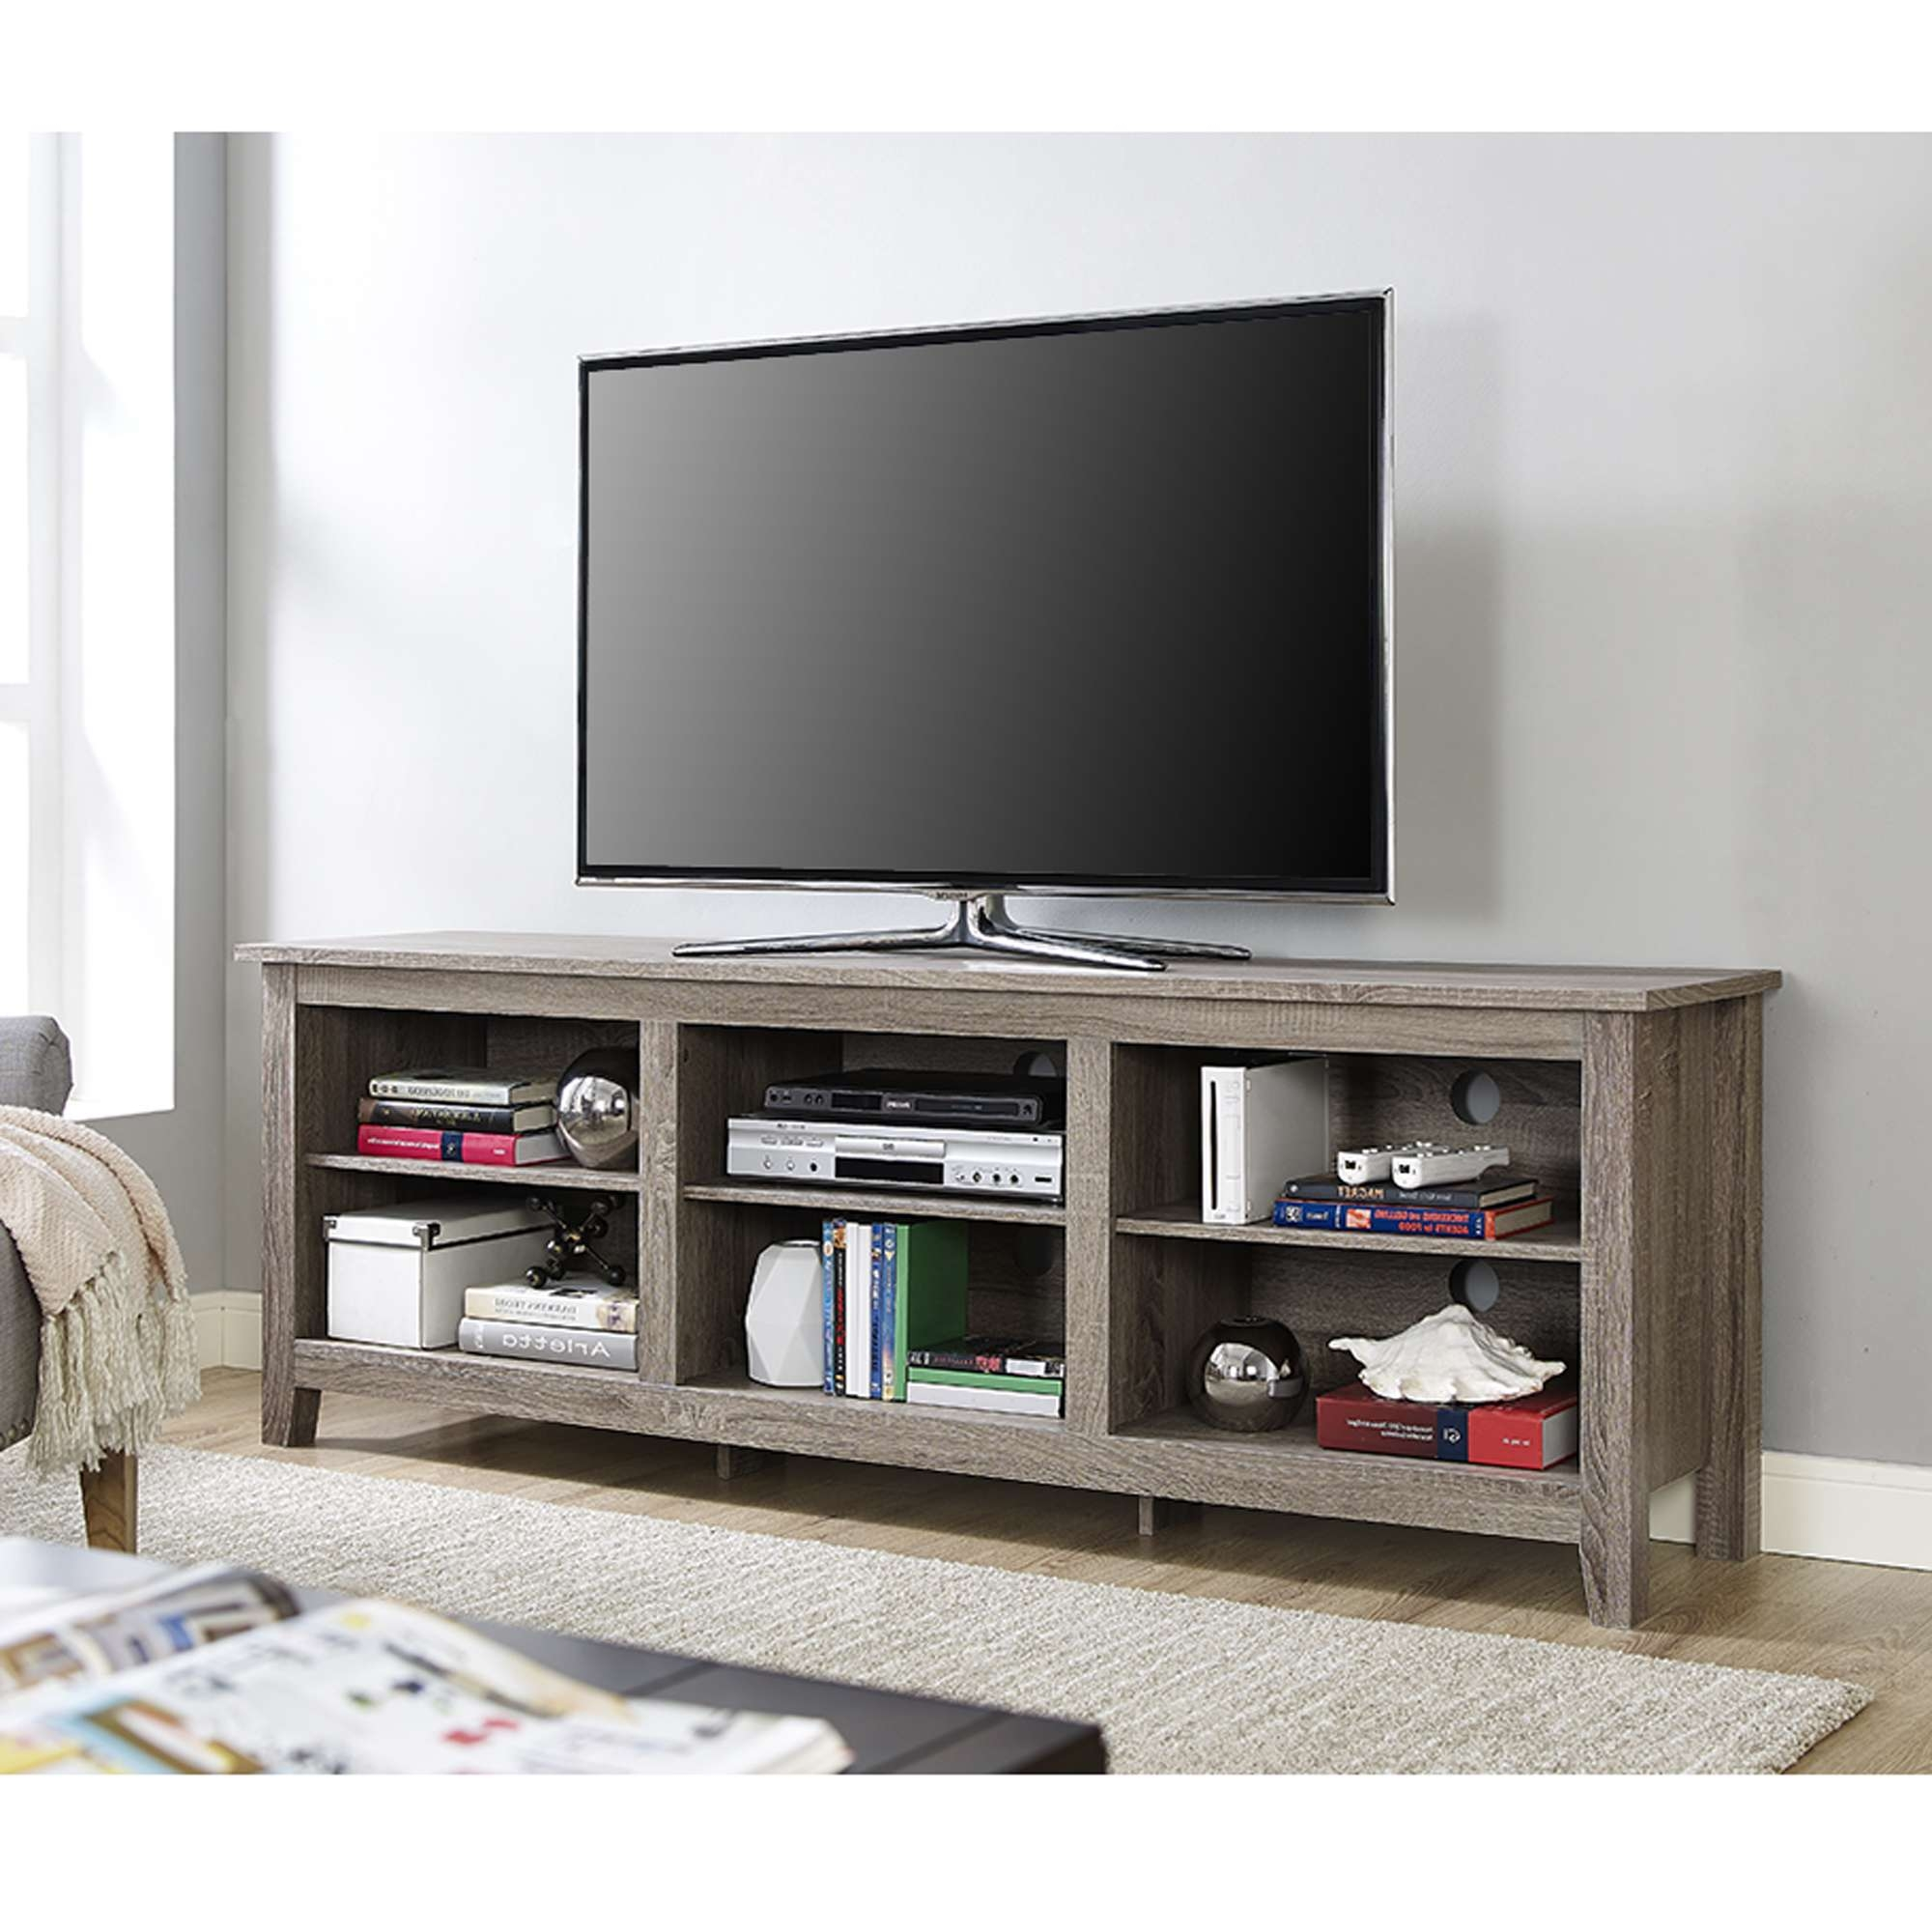 Tv : Light Wood Tv Stand 04 07 Amazing Light Brown Tv Stands Light Within Light Brown Tv Stands (View 5 of 20)